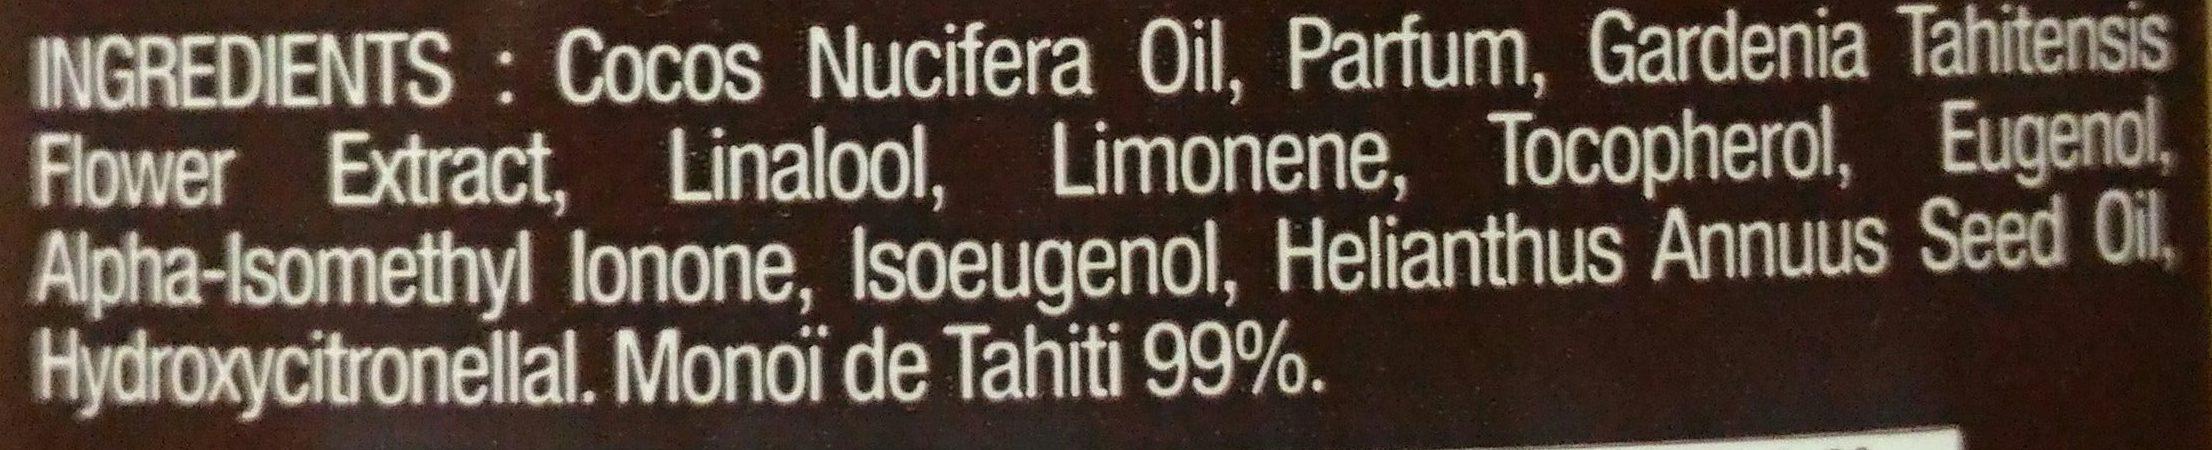 Véritable Monoï de Tahiti - Ingredients